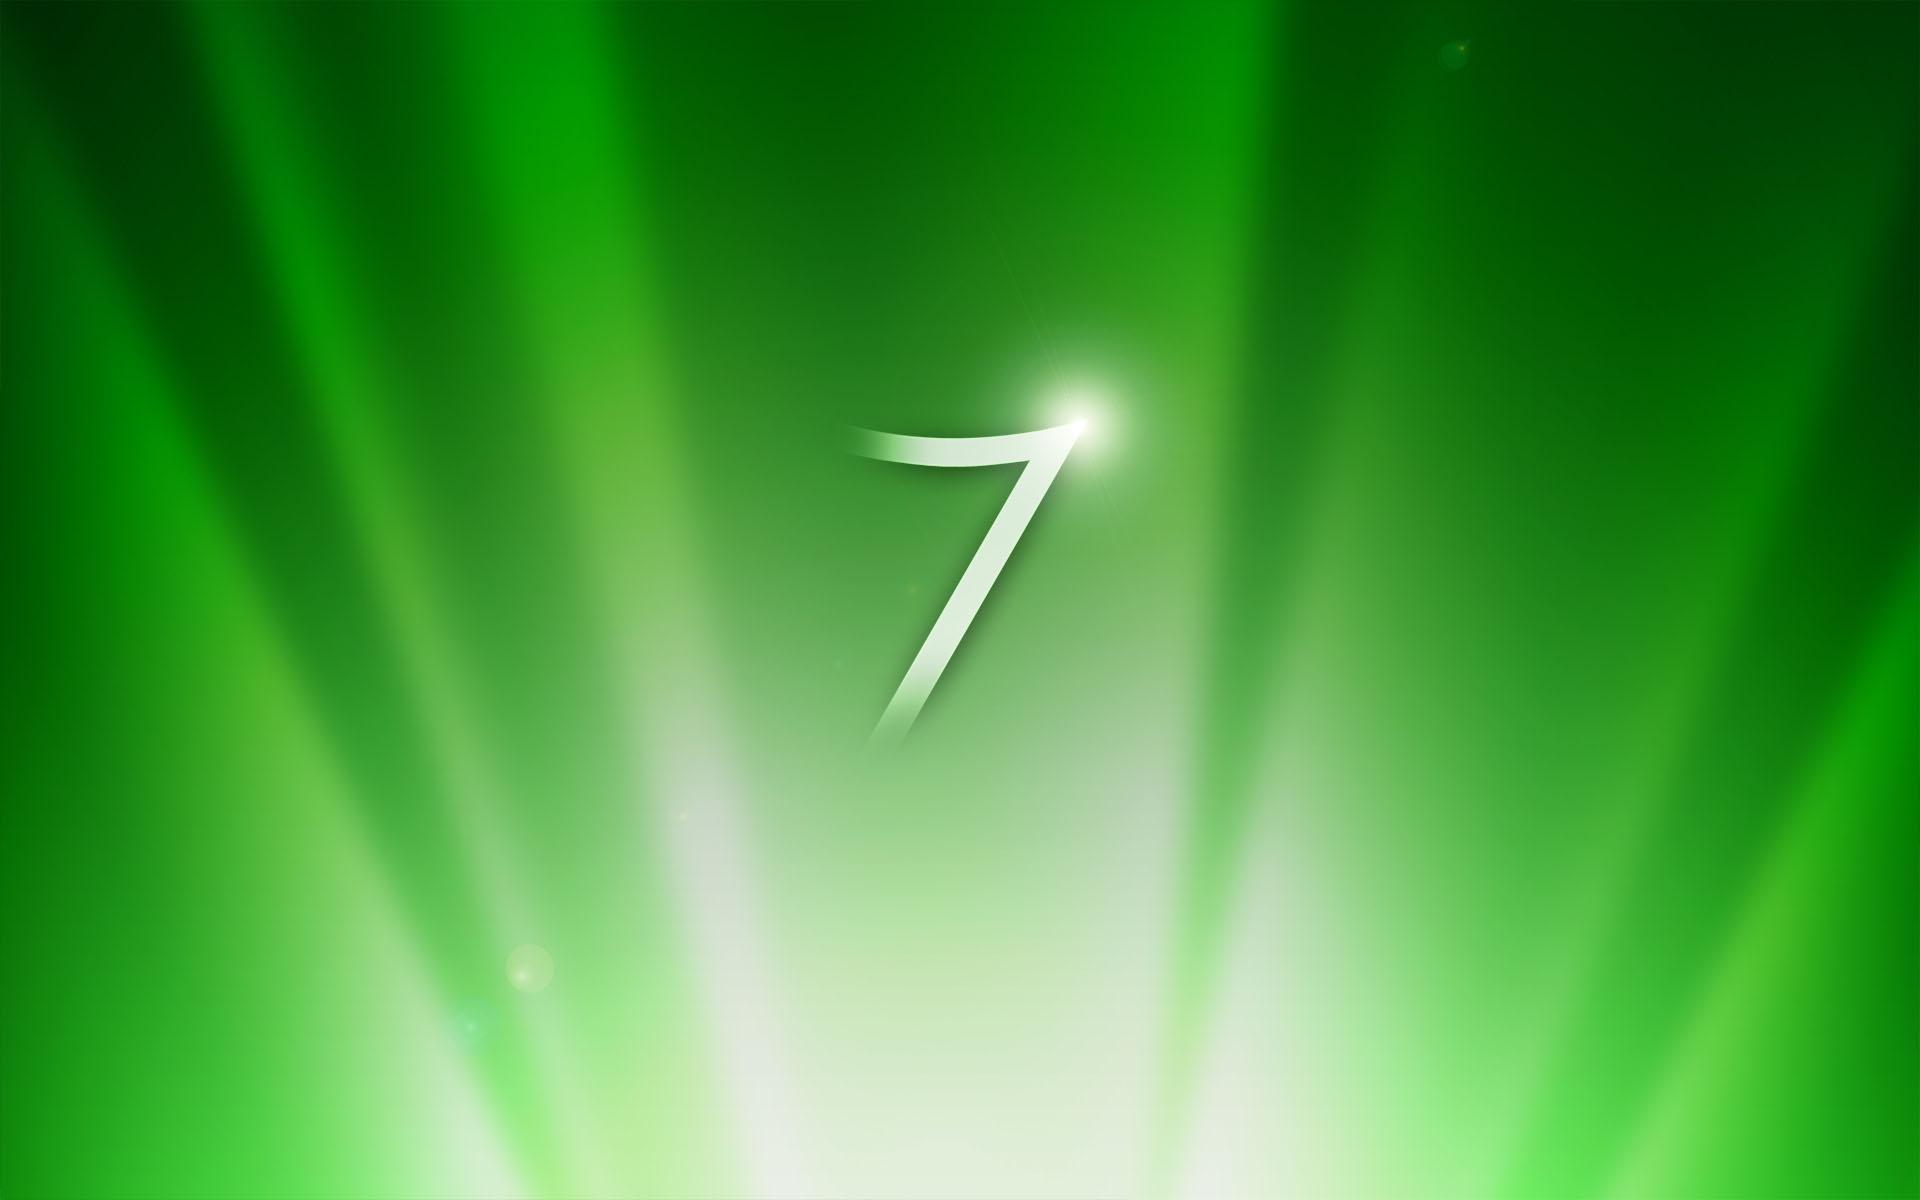 Windows7--زй-online.sccnn.com